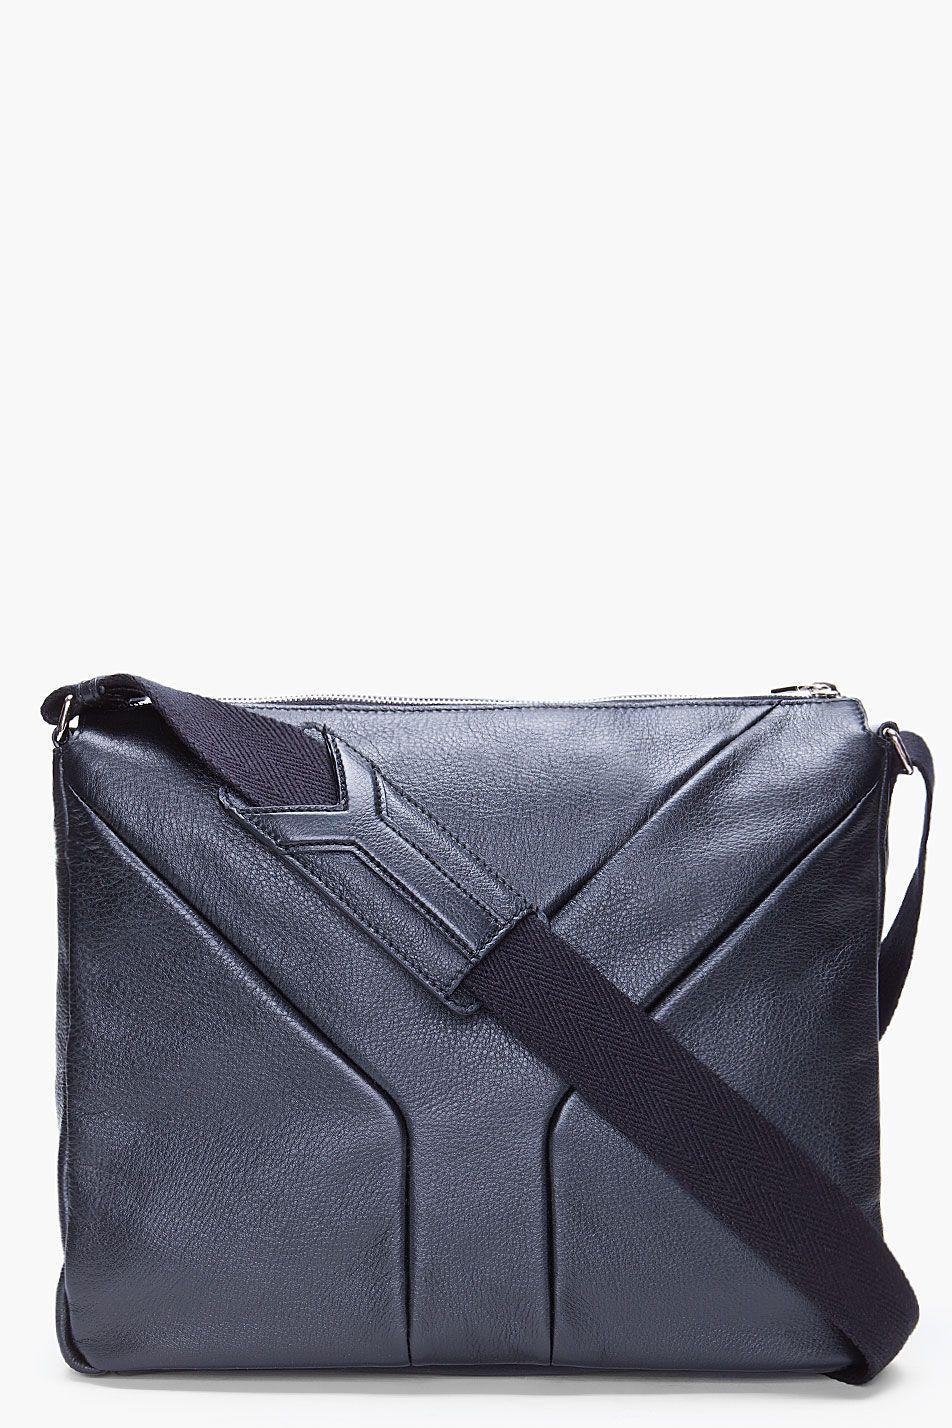 a4aeb464764 YVES SAINT LAURENT // Small Black BV HAMPTONS Bag | BAGS/PORTFOLIOS ...